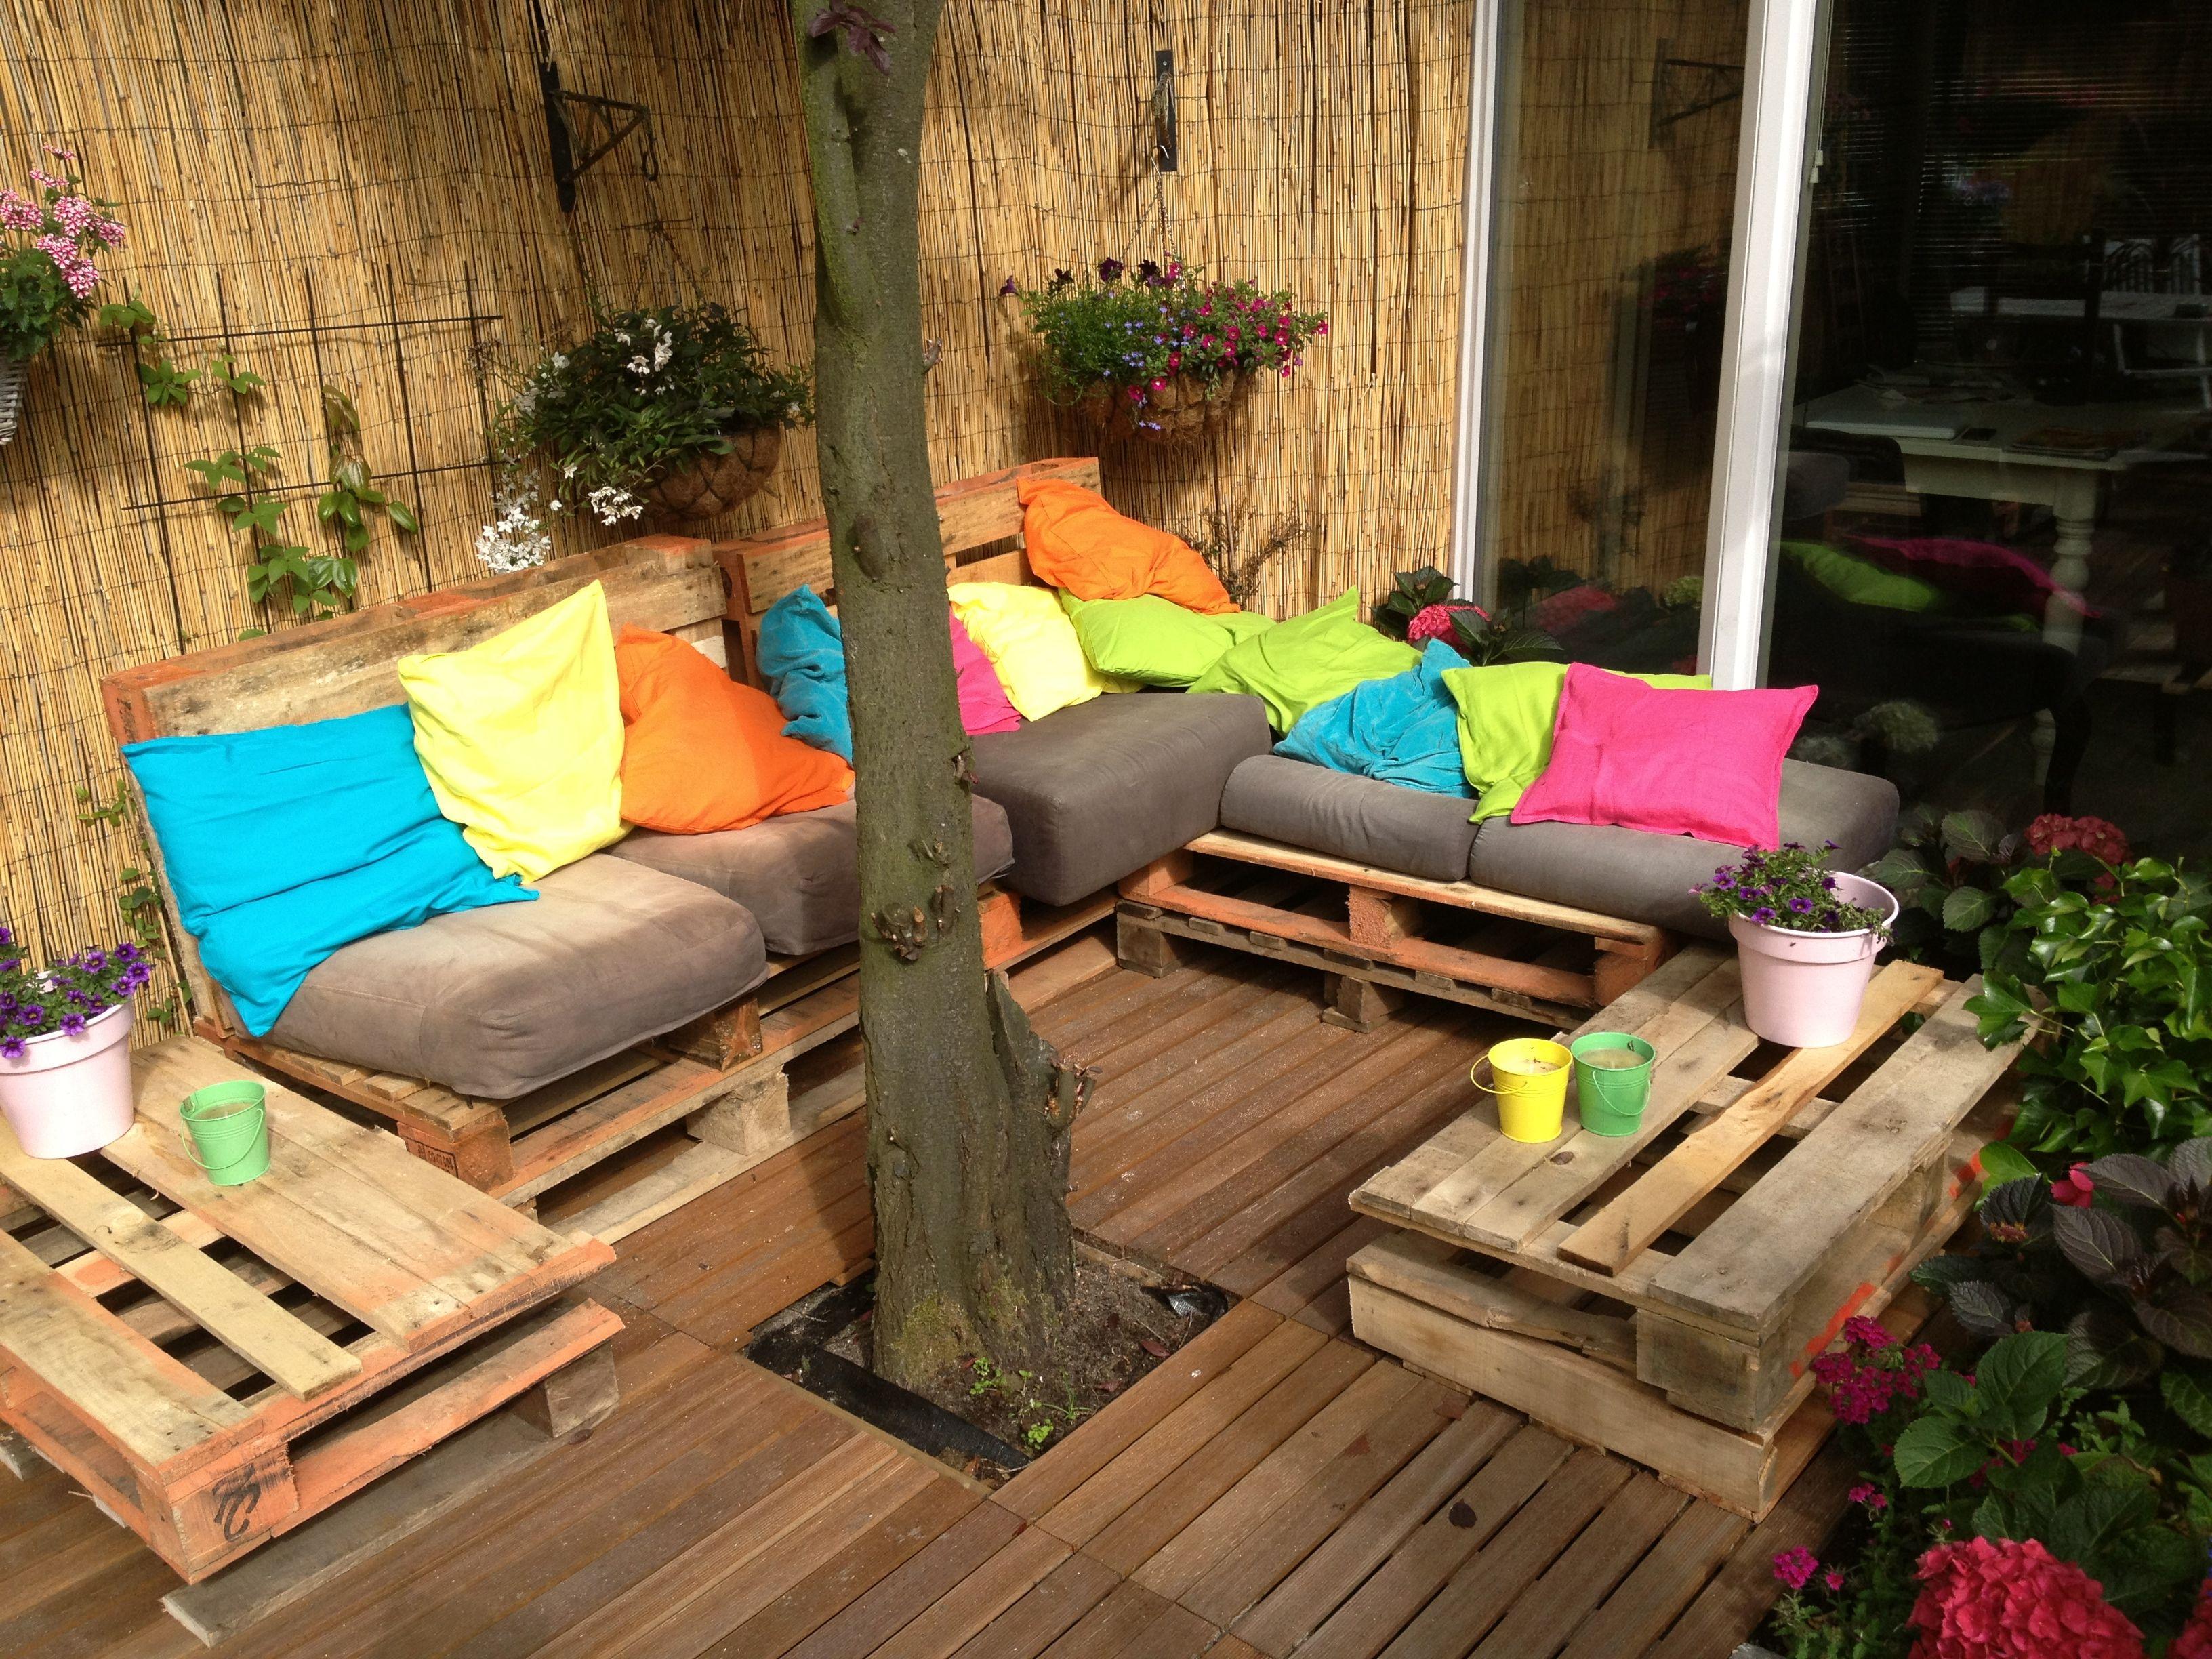 meubler son jardin sans se ruiner